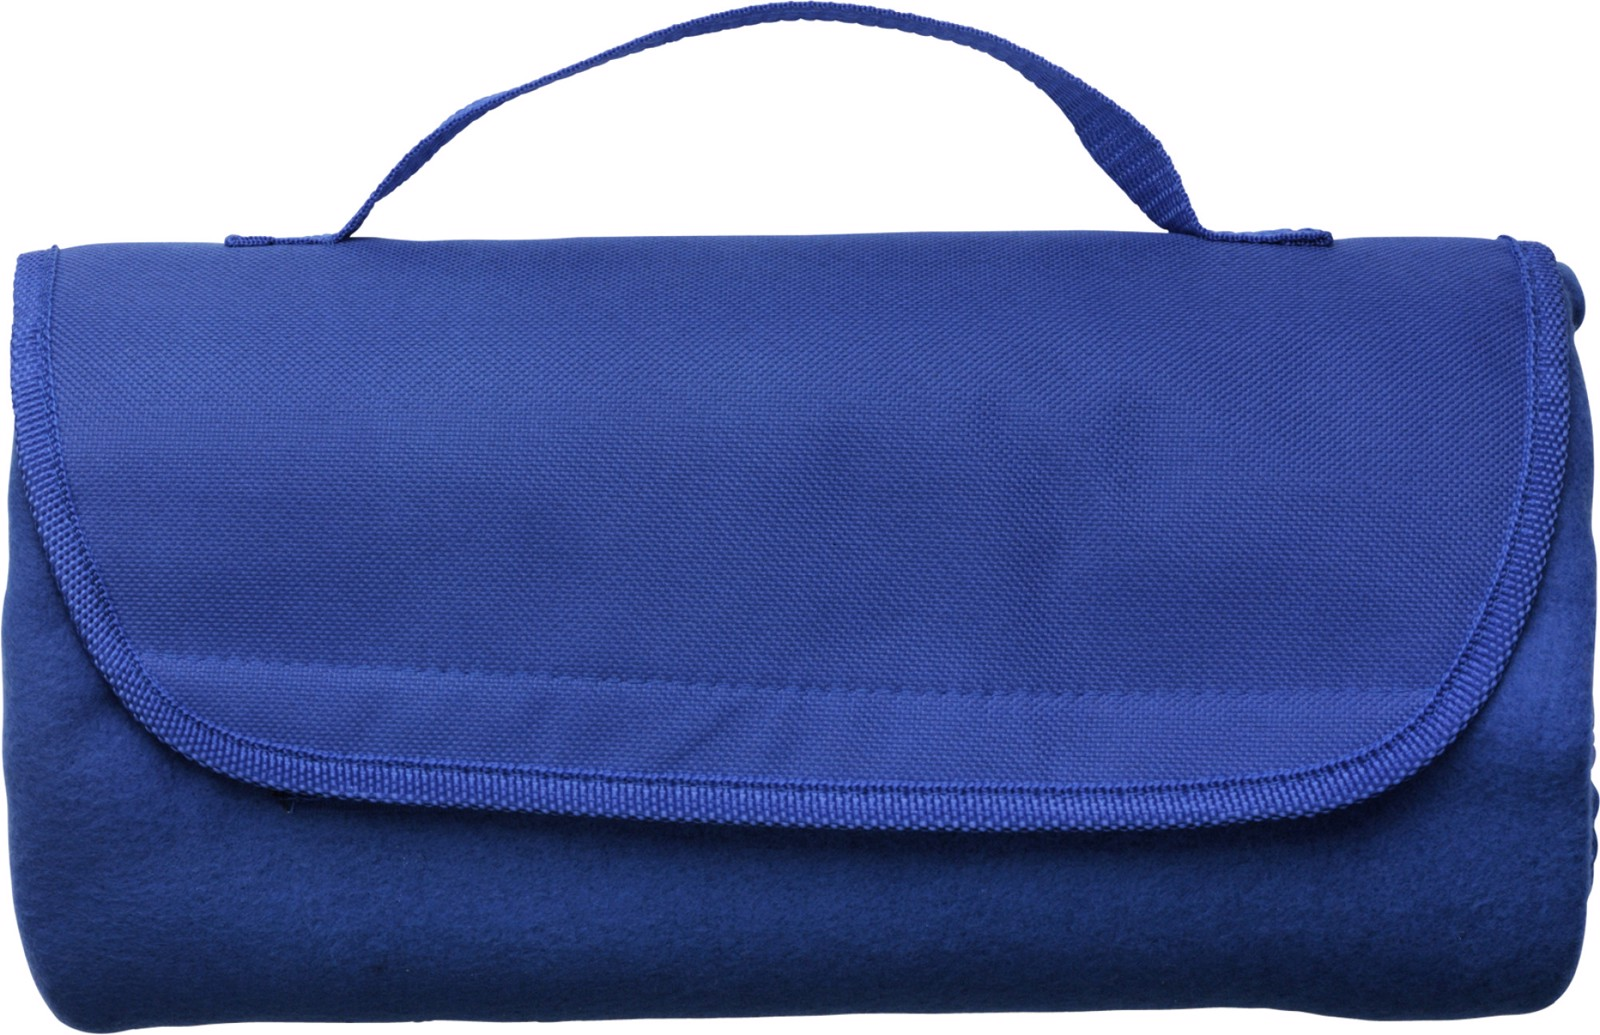 Fleece (165 g/m²) travel blanket - Cobalt Blue